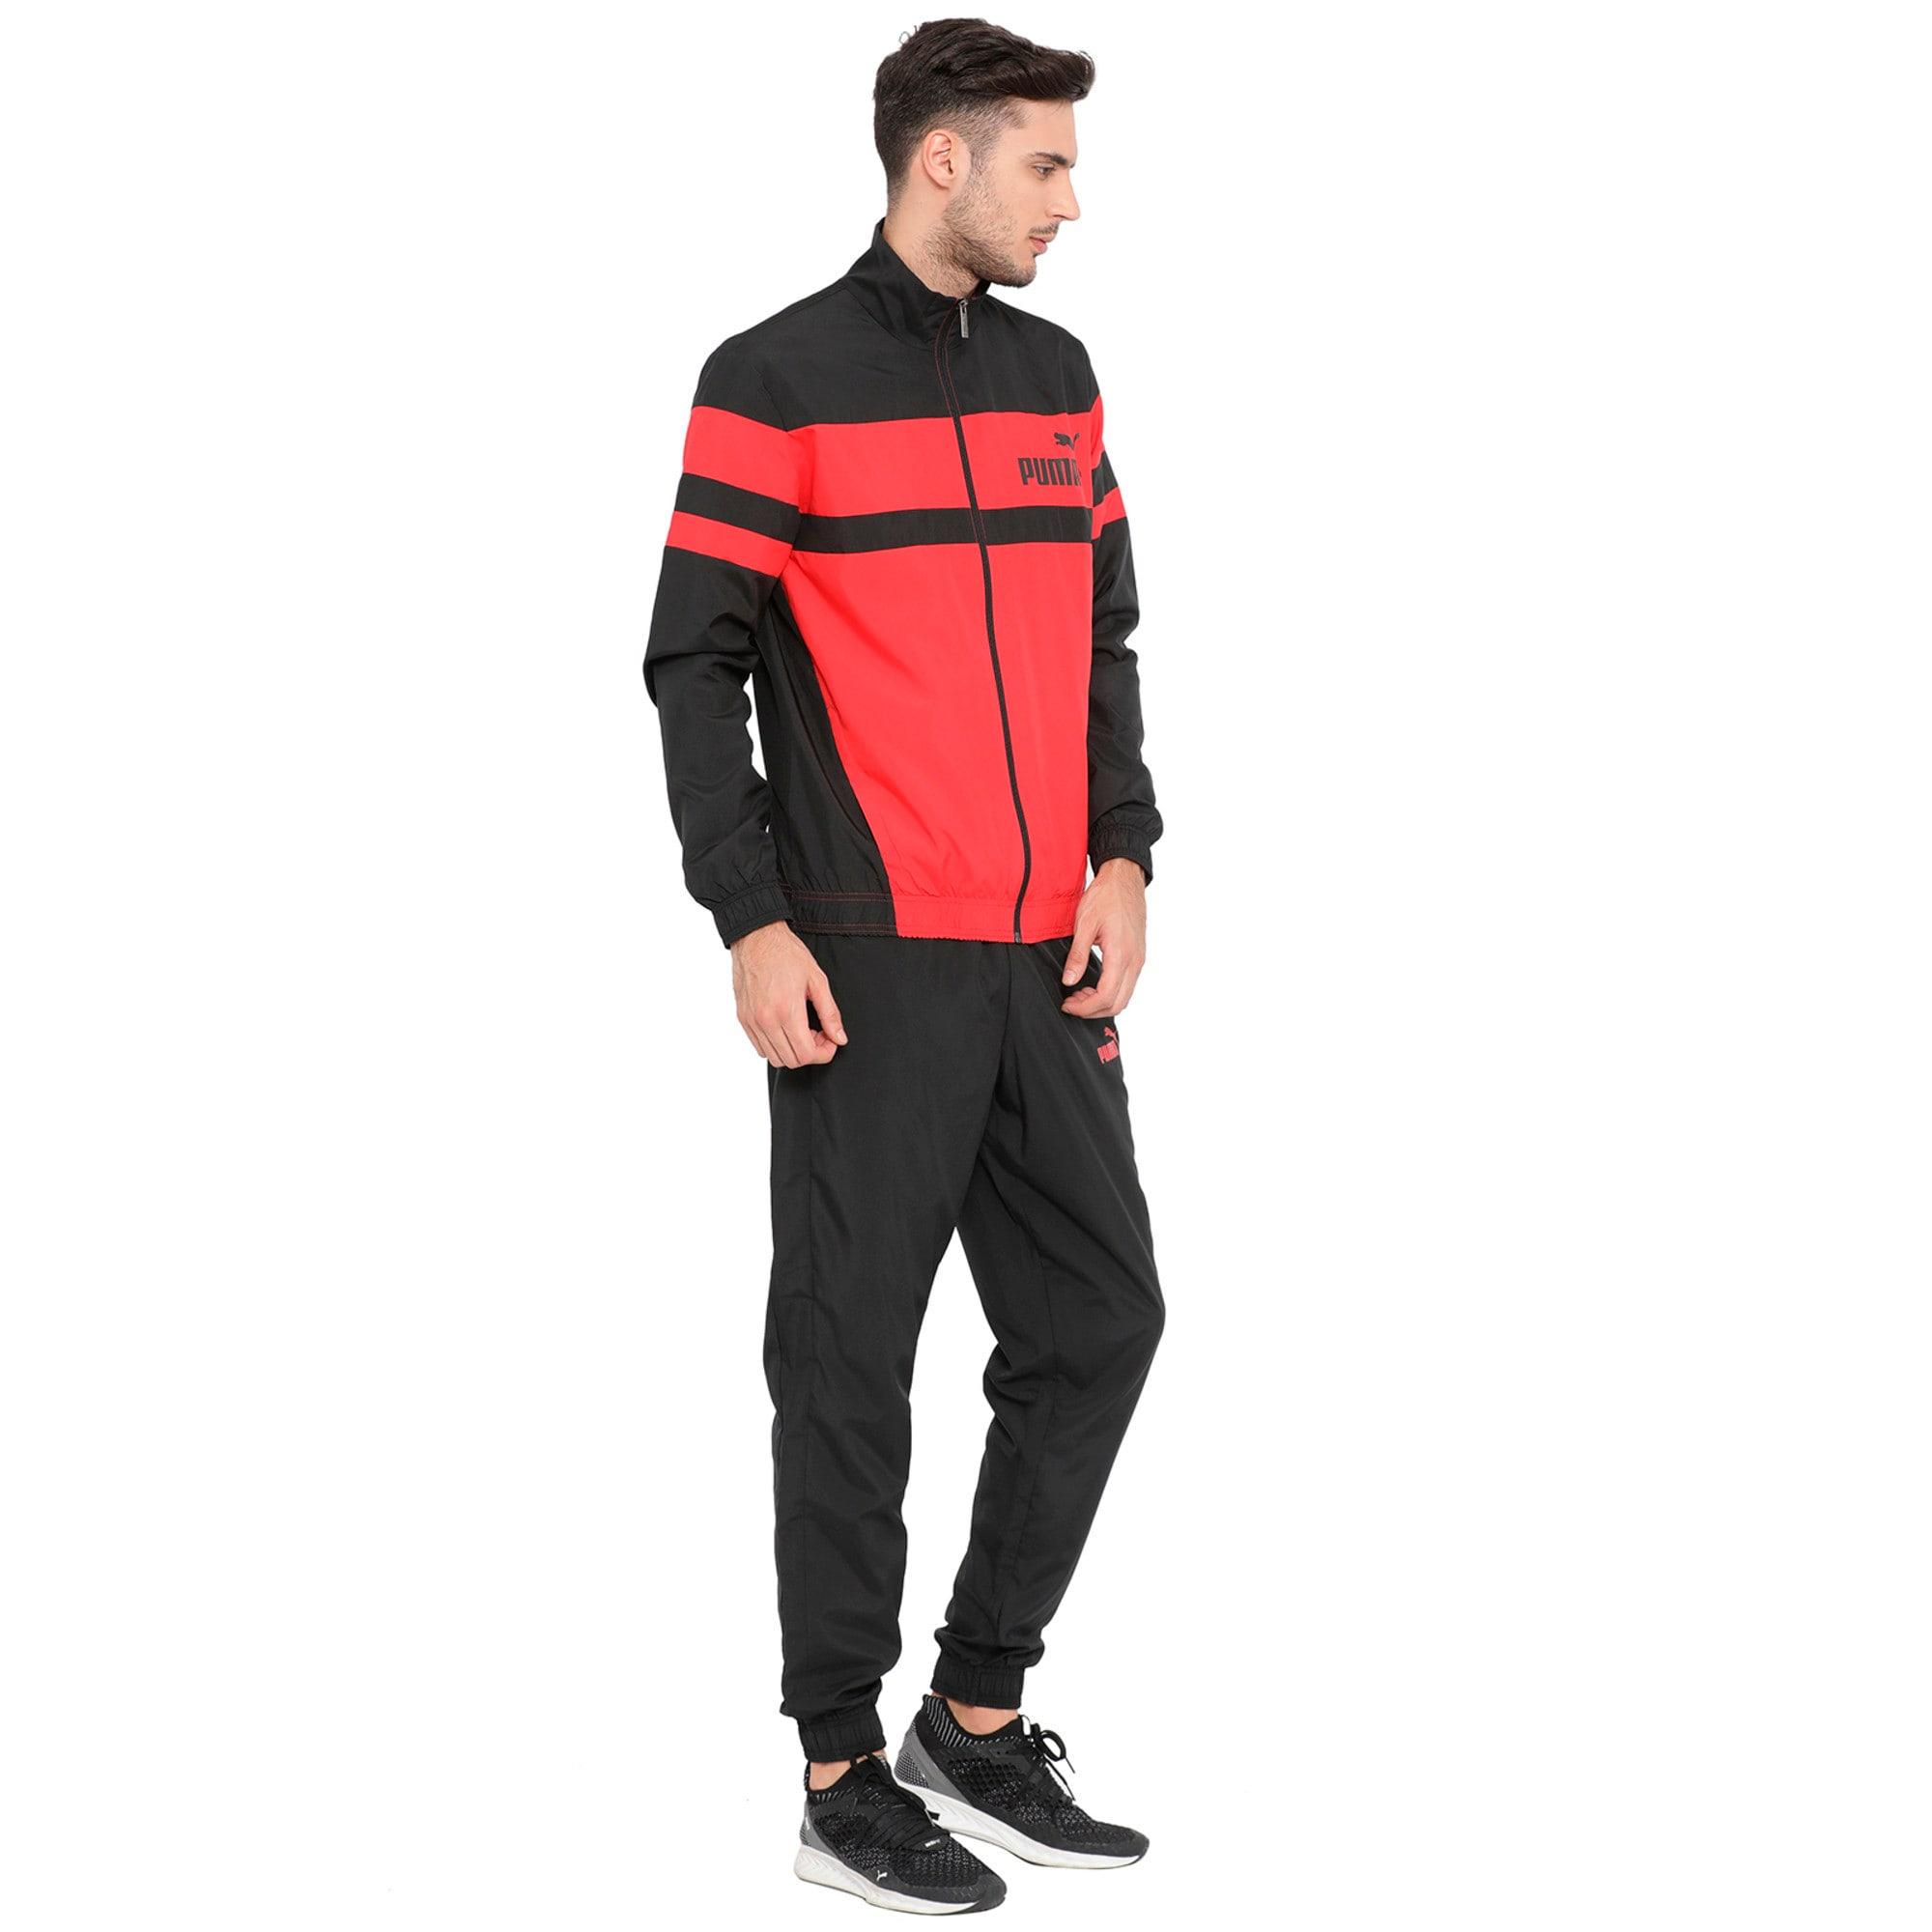 Thumbnail 1 of CB Woven Suit, Ribbon Red-Puma Black, medium-IND